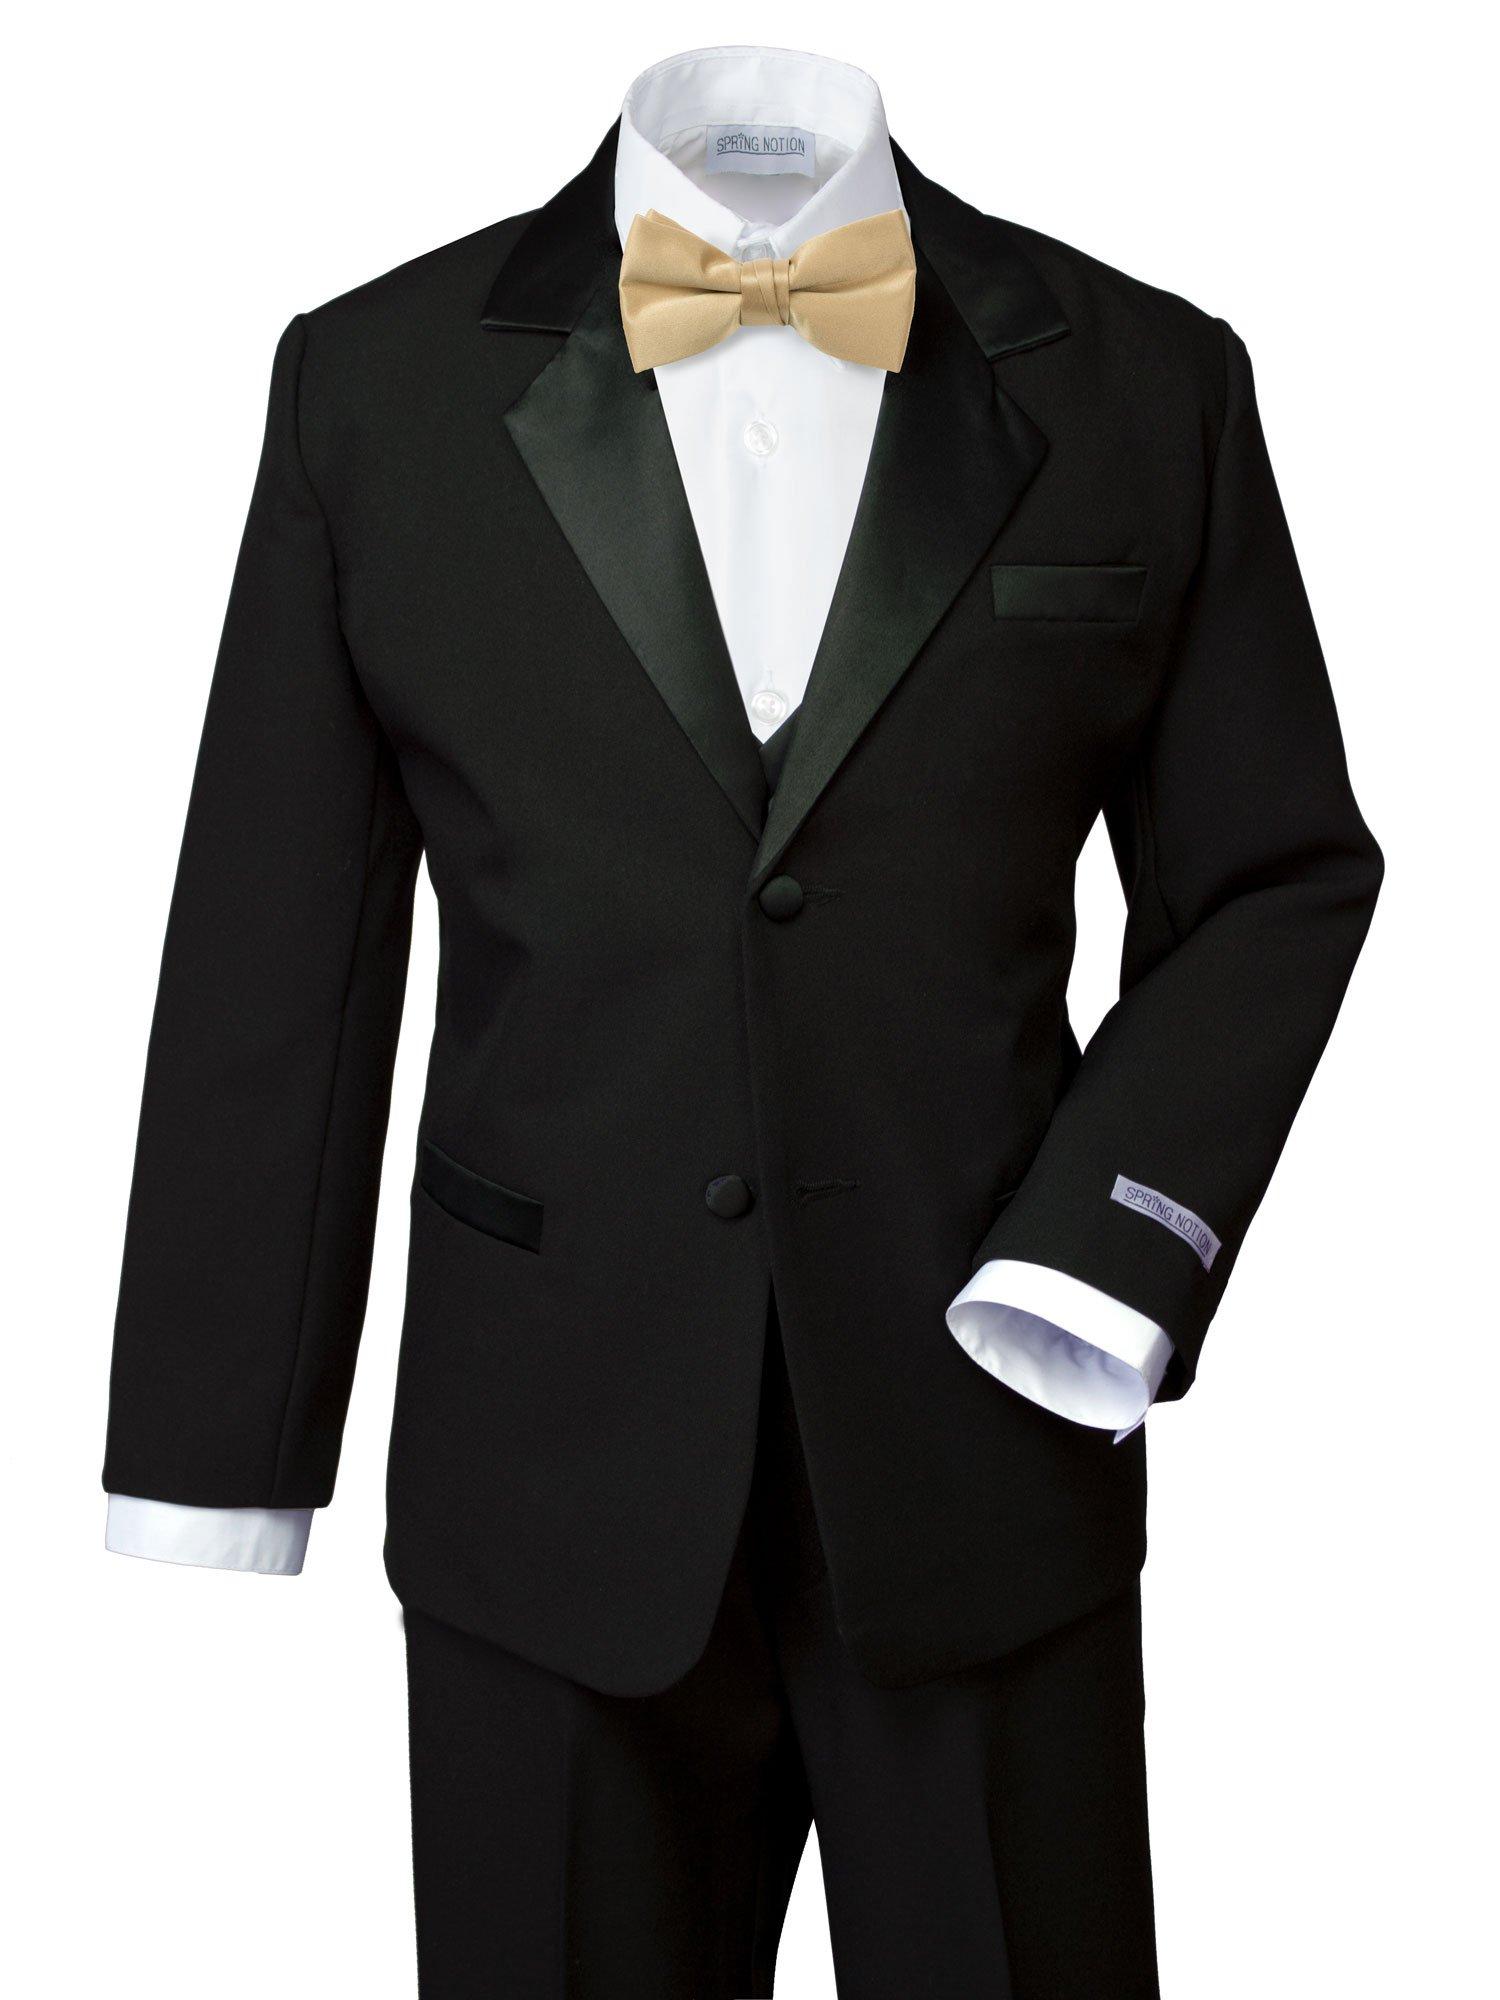 Spring Notion Boys' Classic Fit Tuxedo Set, No Tail Large/12-18M Black-Antique Gold